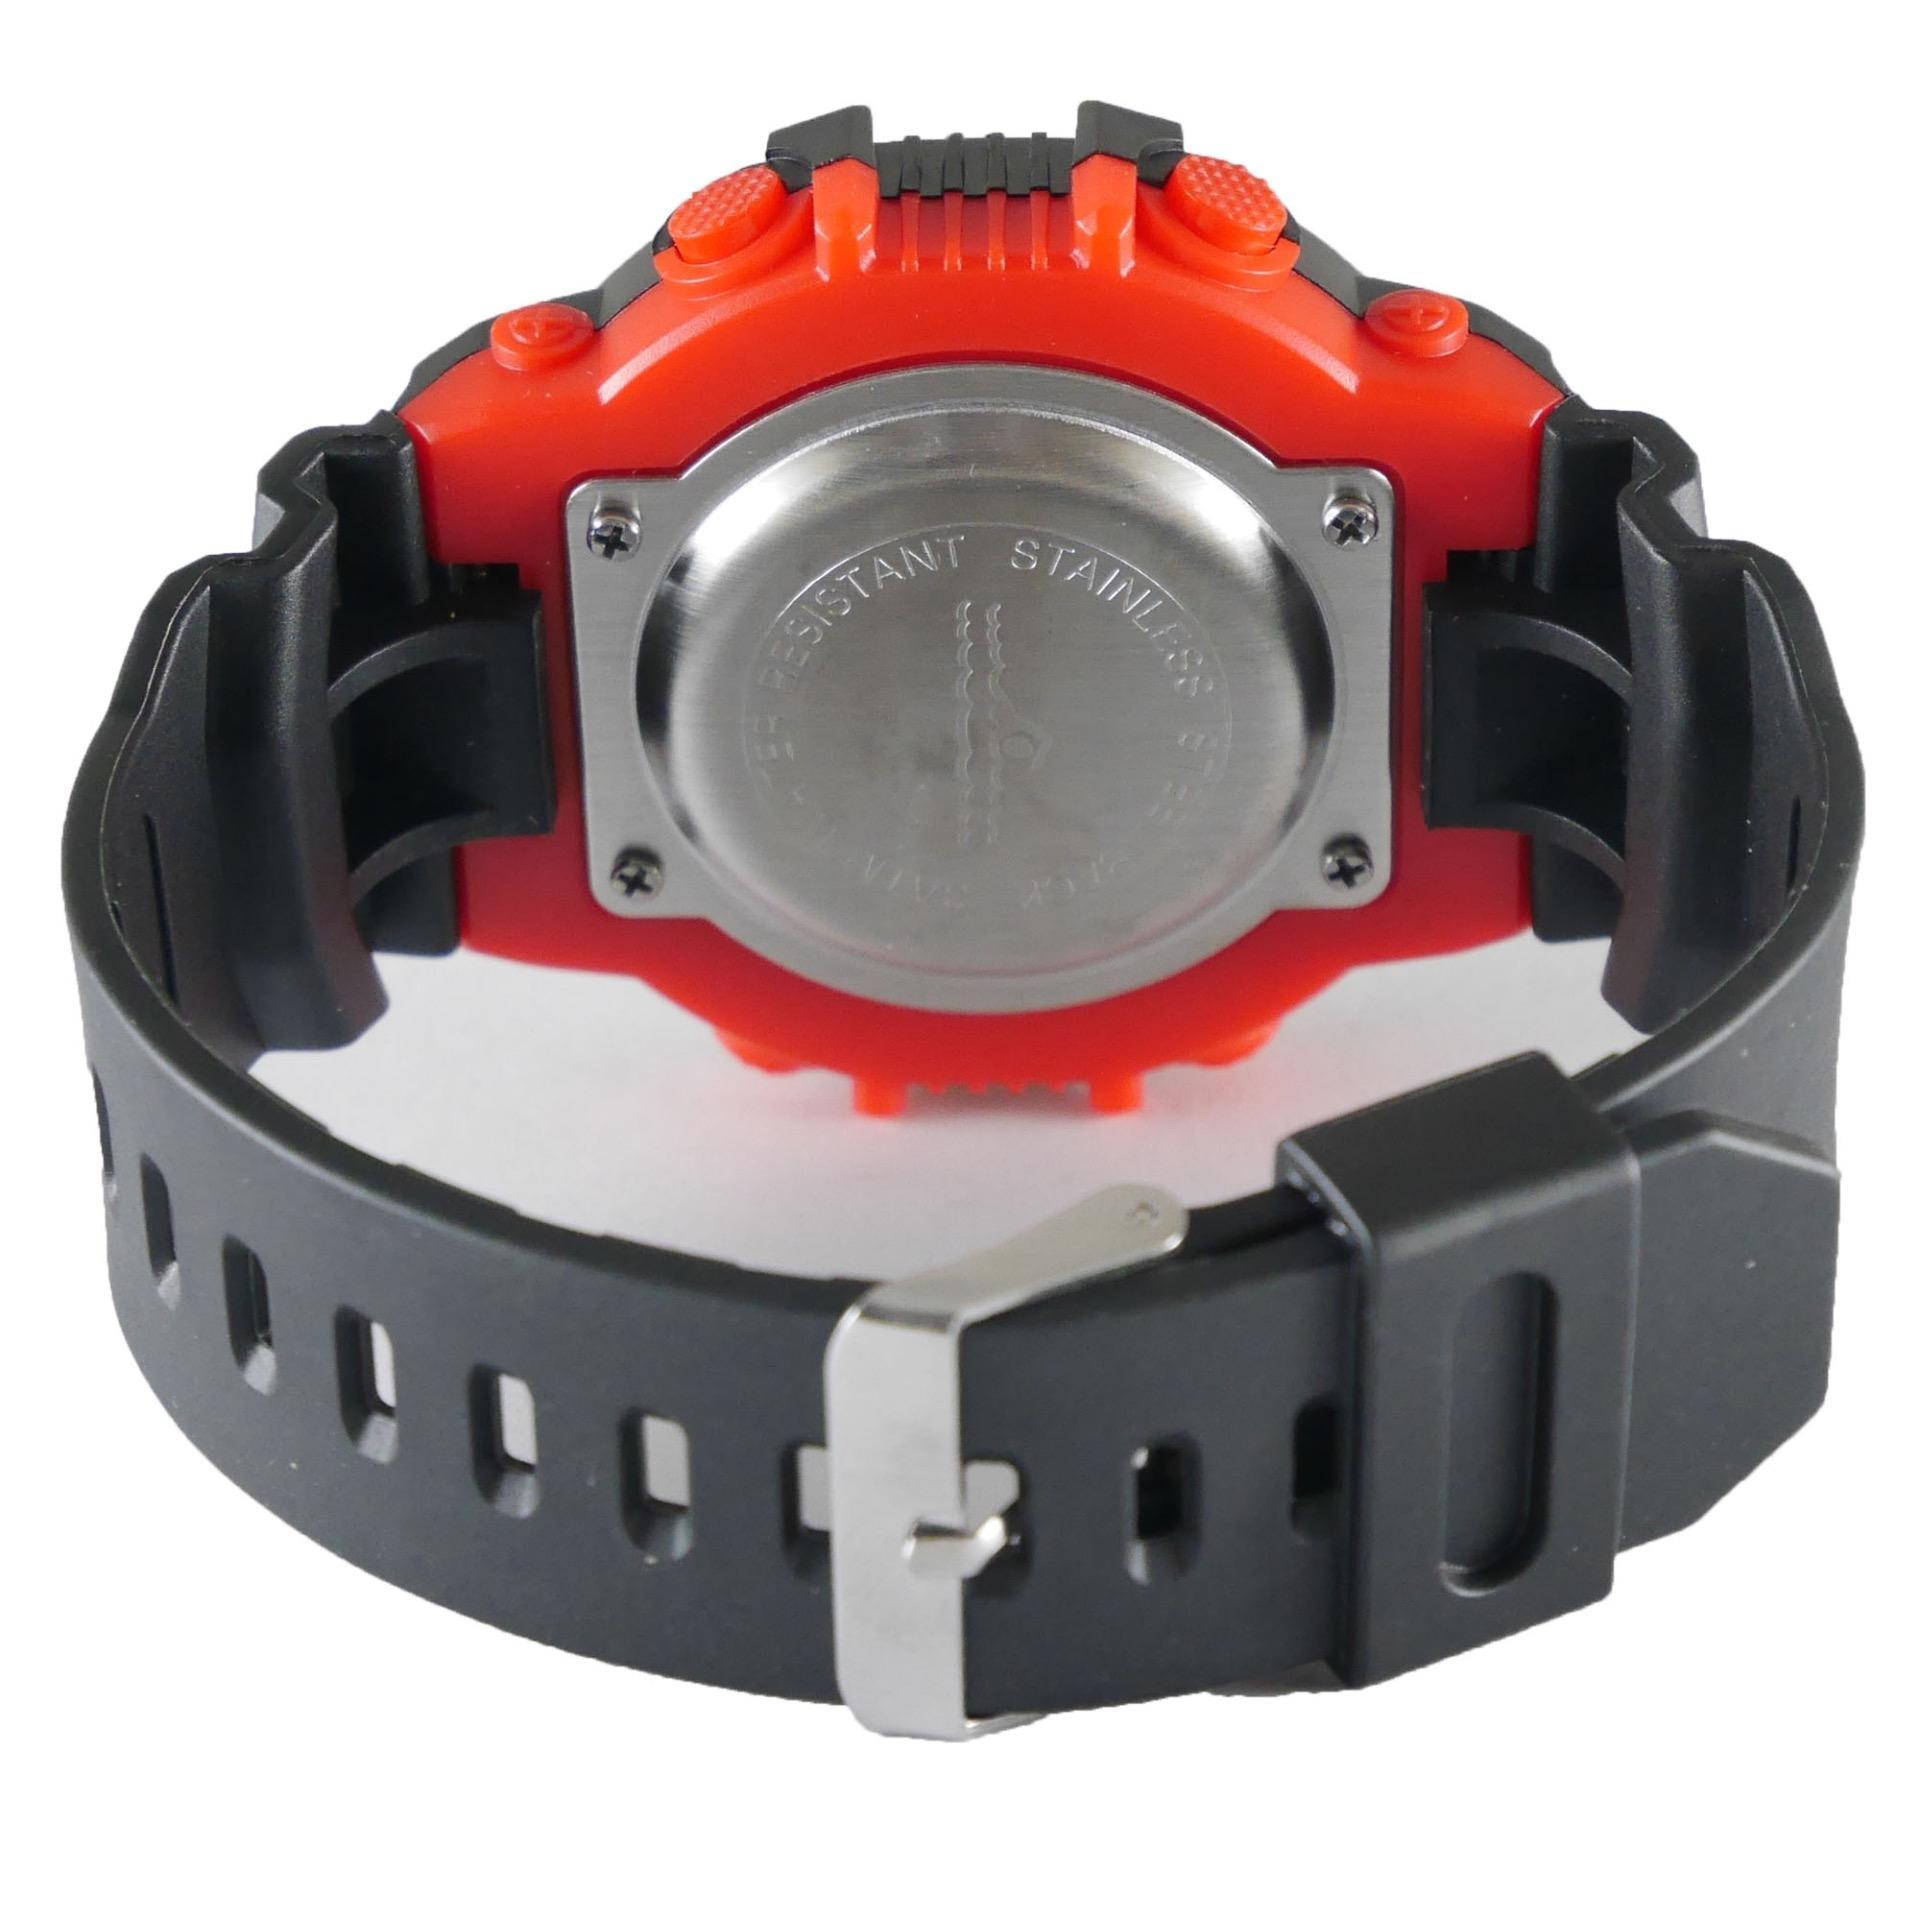 Qq Jam Tangan Digital Pria Rubber Hitam Dial Bezel Merah Sport Qq0199 Waterresist